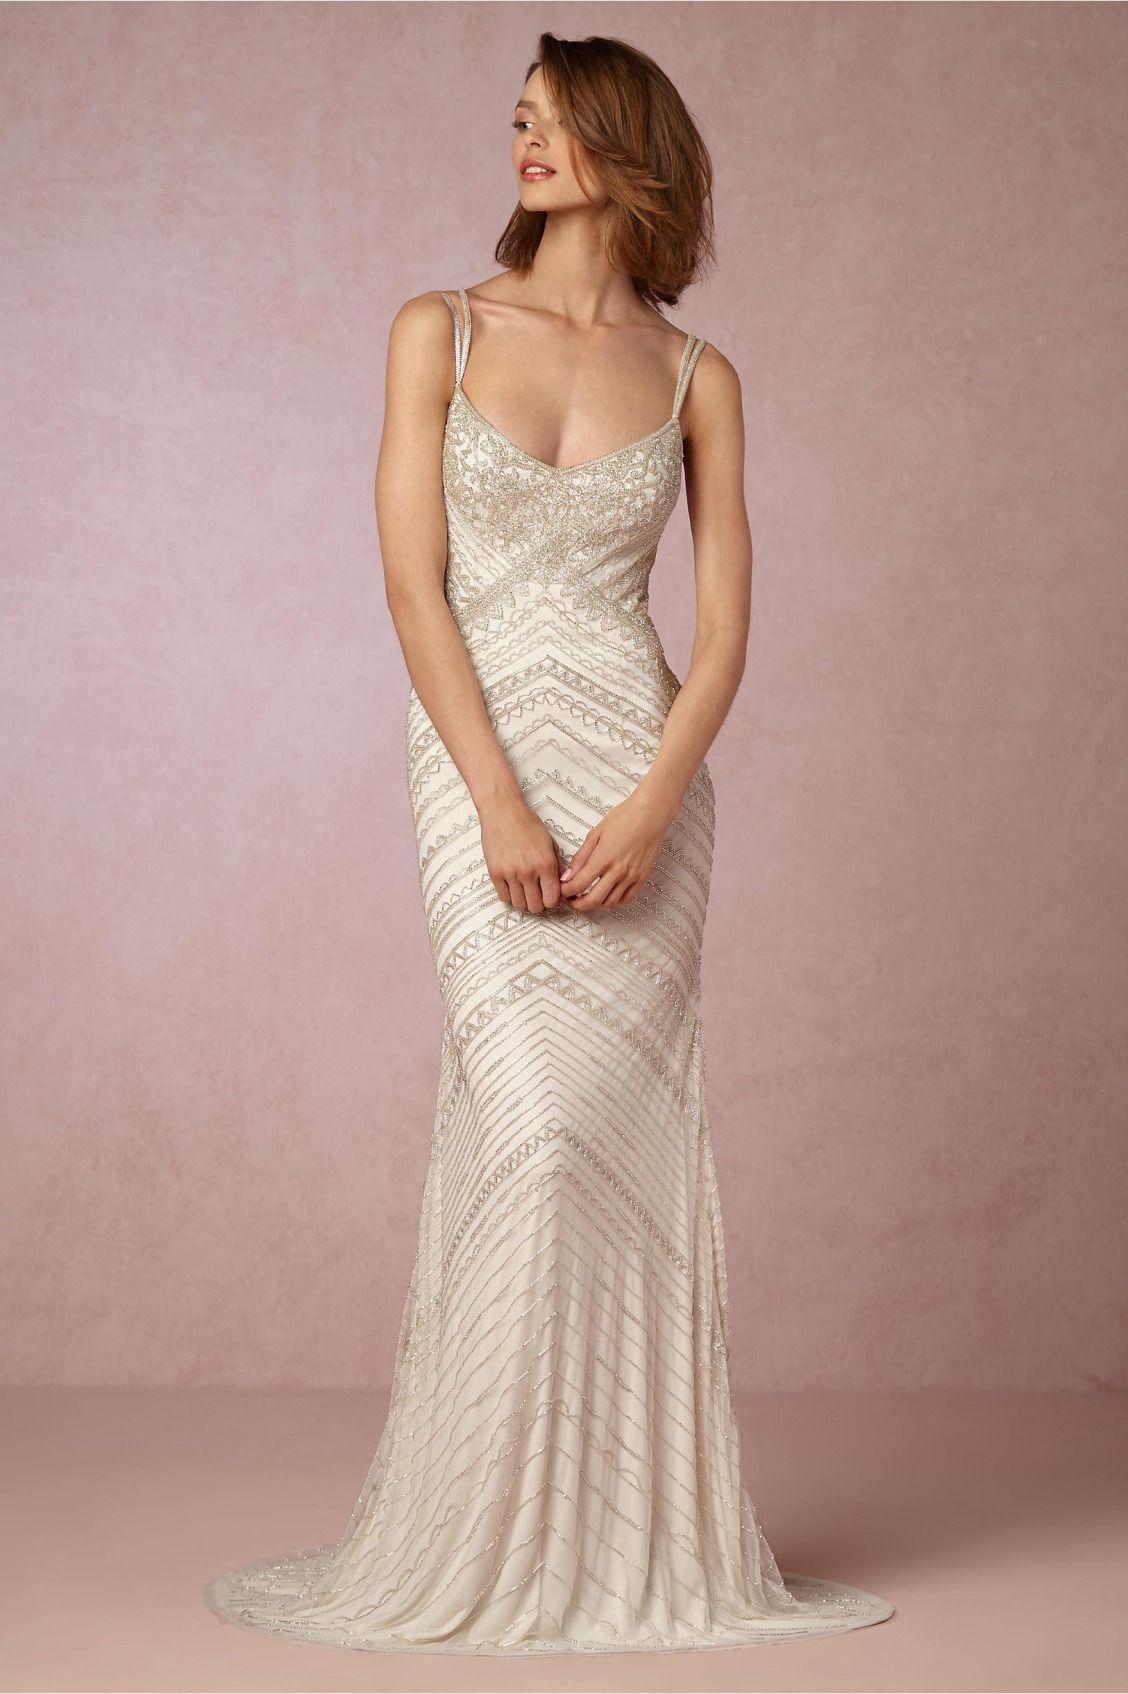 d6d95e9e23a1 exquisite beadwork | Joslyn Gown from BHLDN | The Modern Bride ...